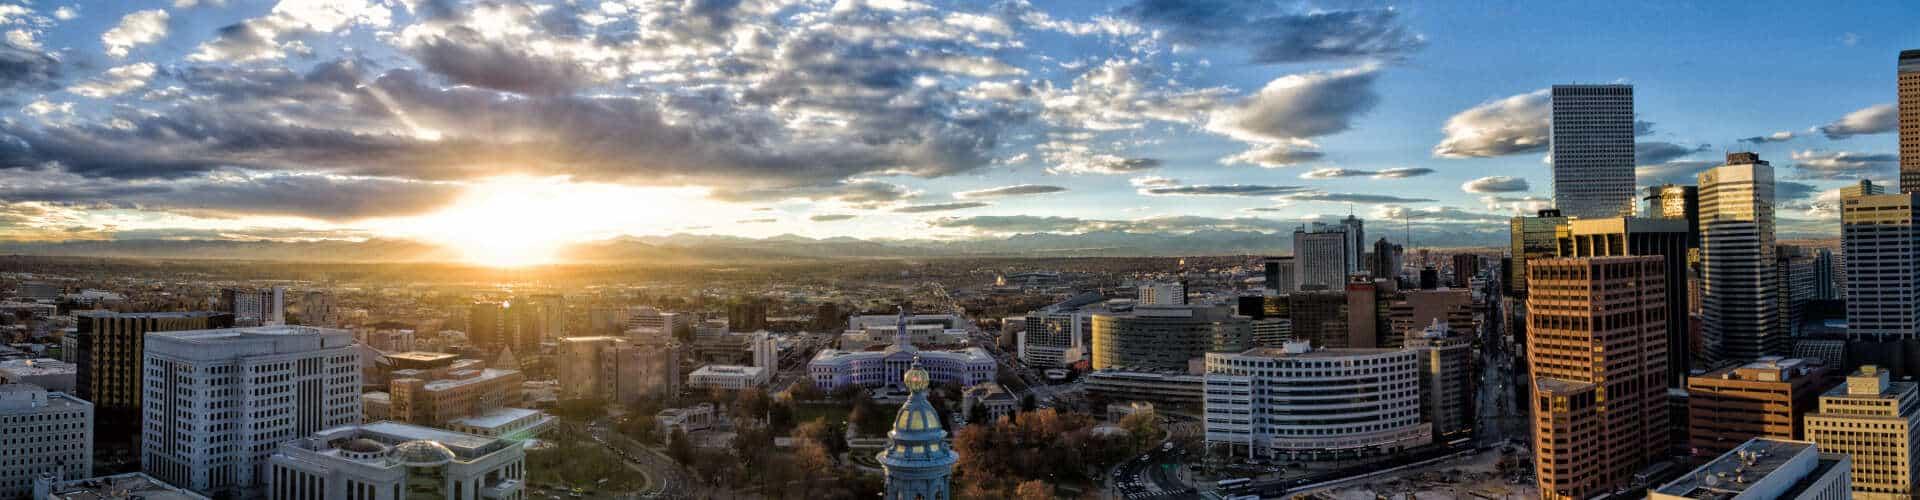 Denver, USA - Risskov Rejser